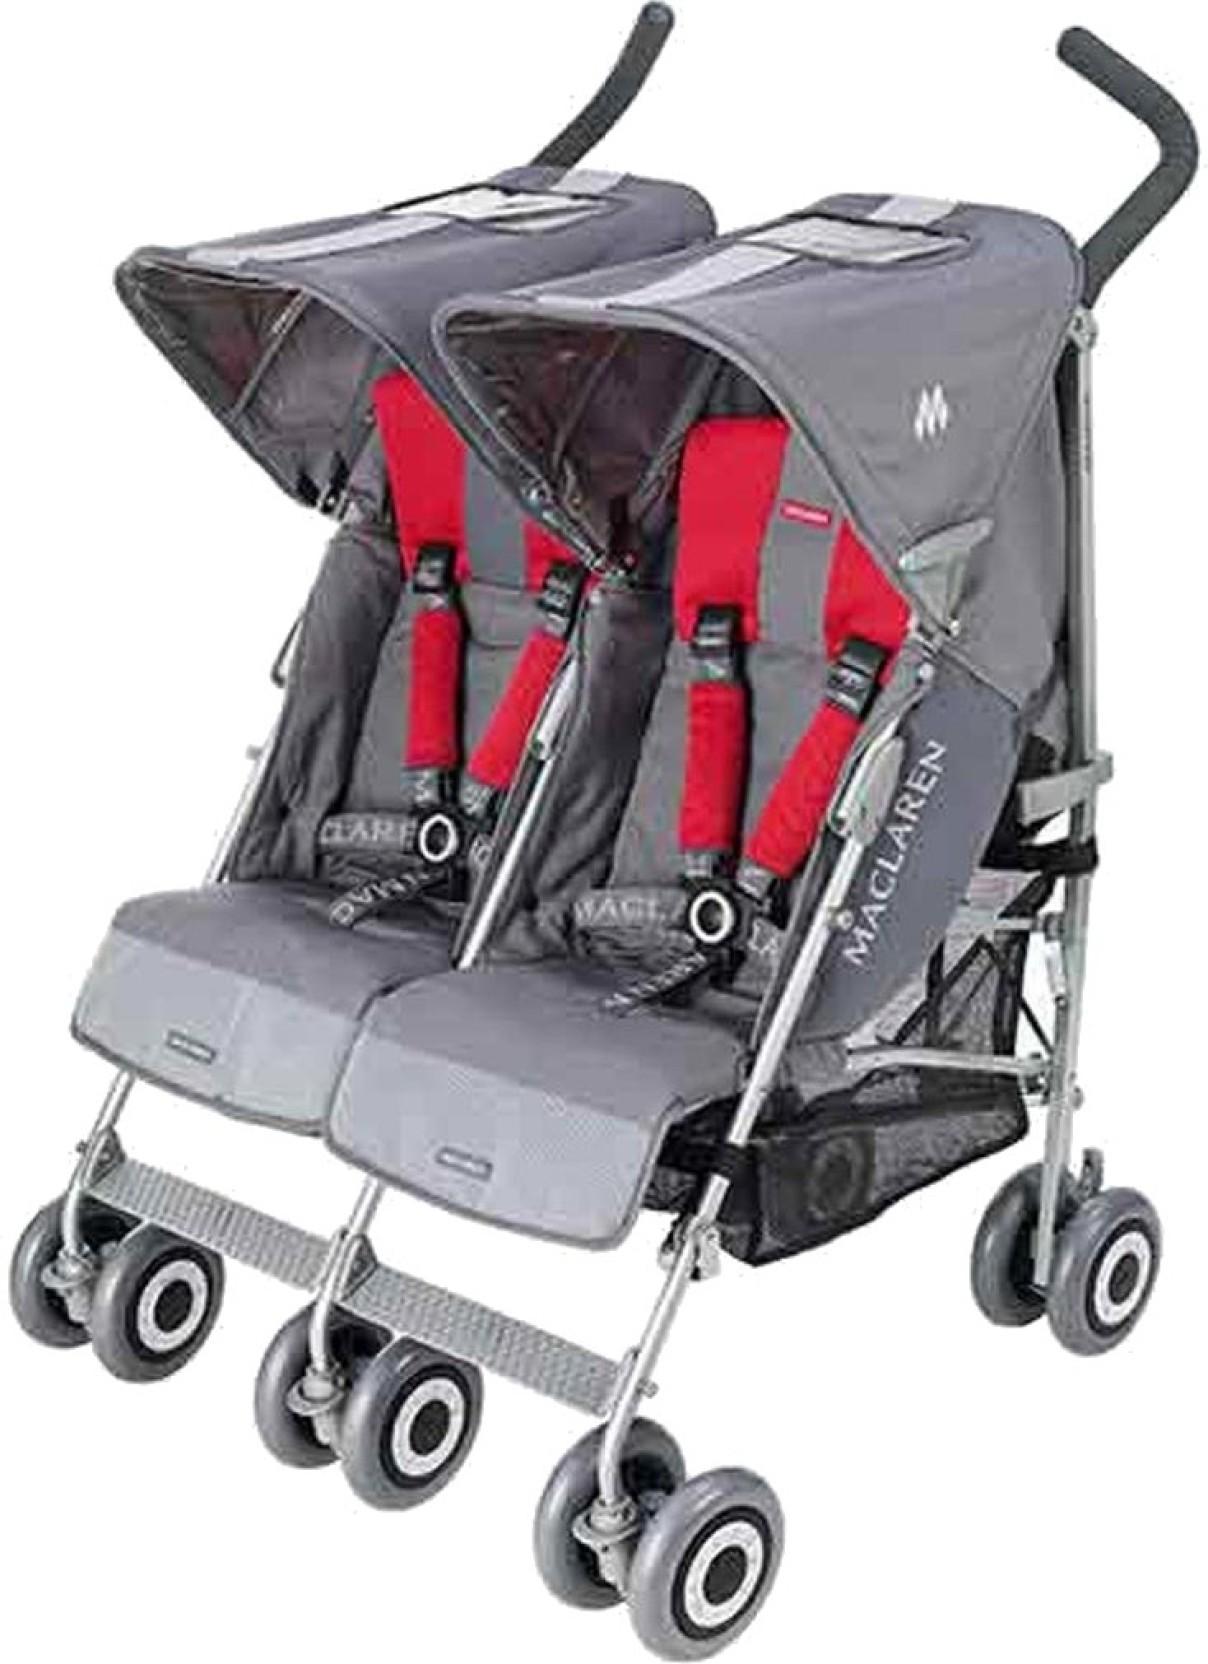 Maclaren Twin Techno - Buy Stroller for 0 - 3 Years